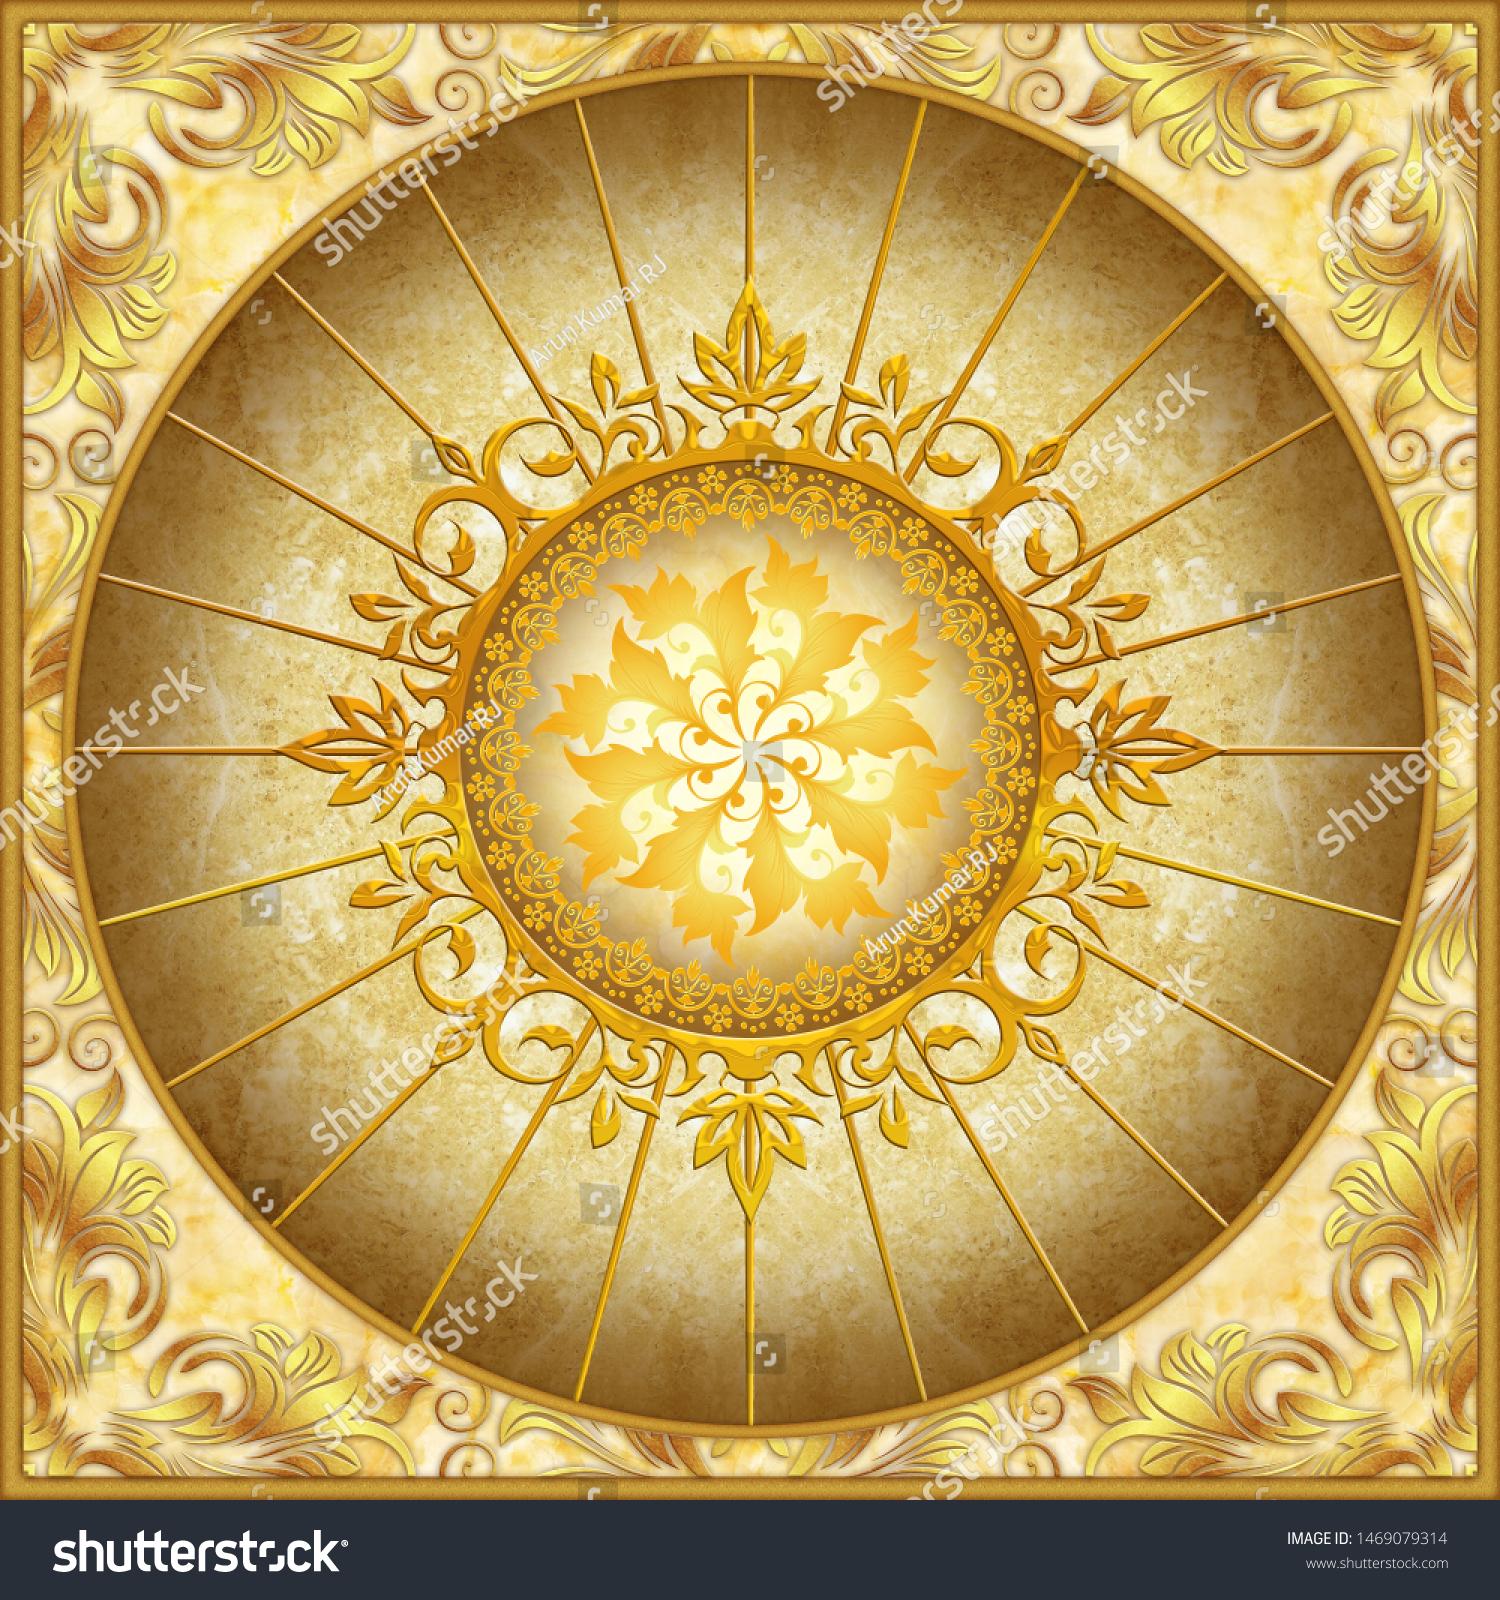 3d Wallpaper Circle Abstract Image Cieling Stock Illustration 1469079314